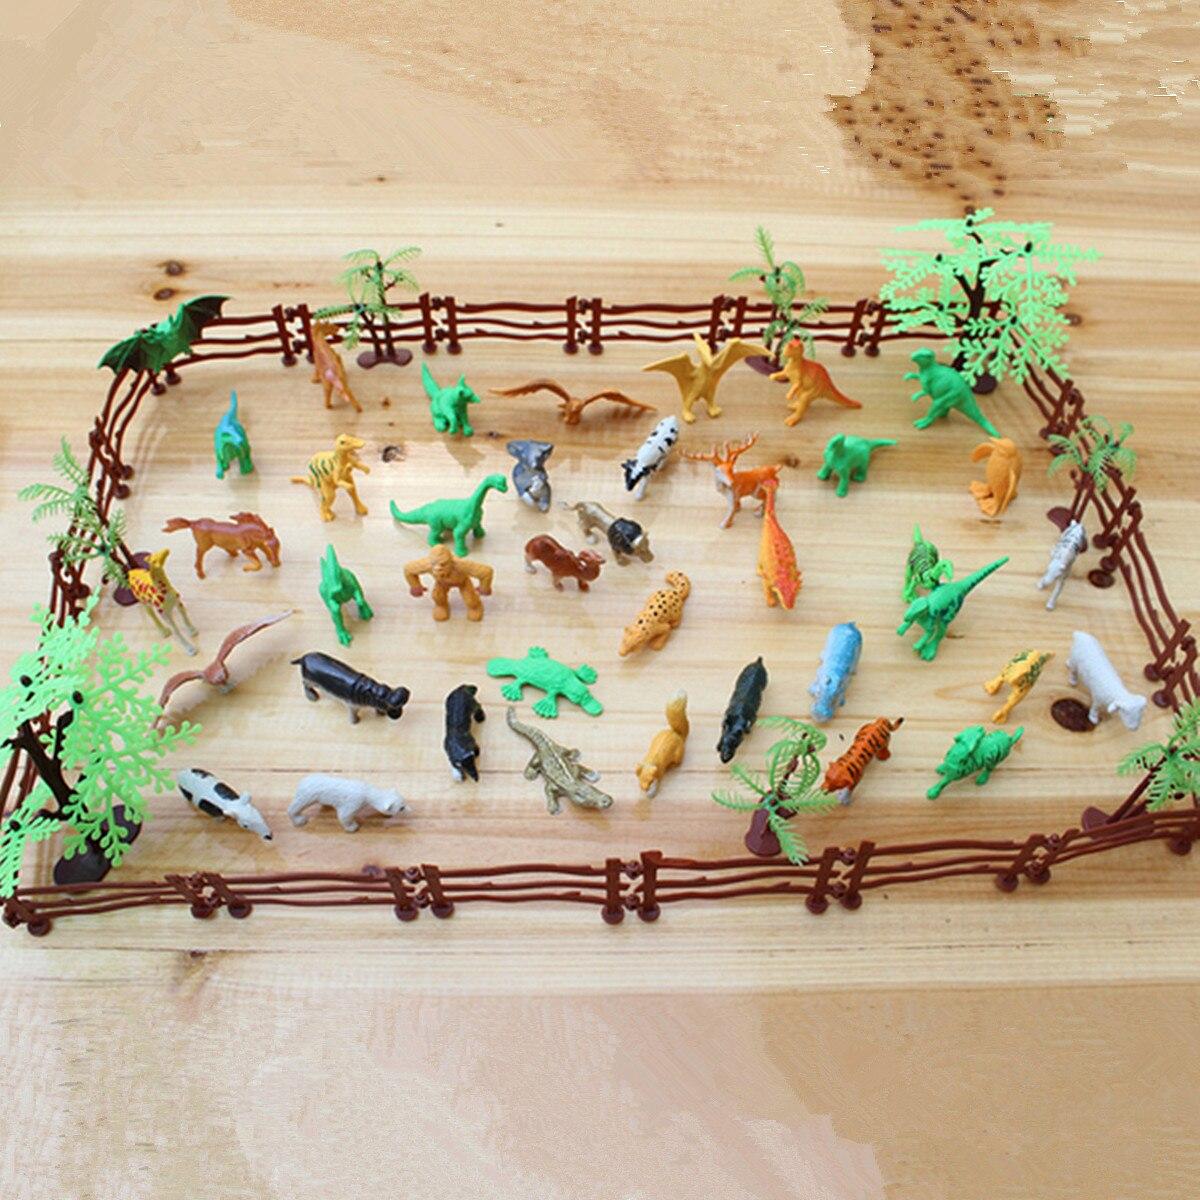 68PCS/set Plastic Farm Yard Wild Fence Tree Animals Model Kids Toys For Children Figures Play Set Toy Kids Adult Action